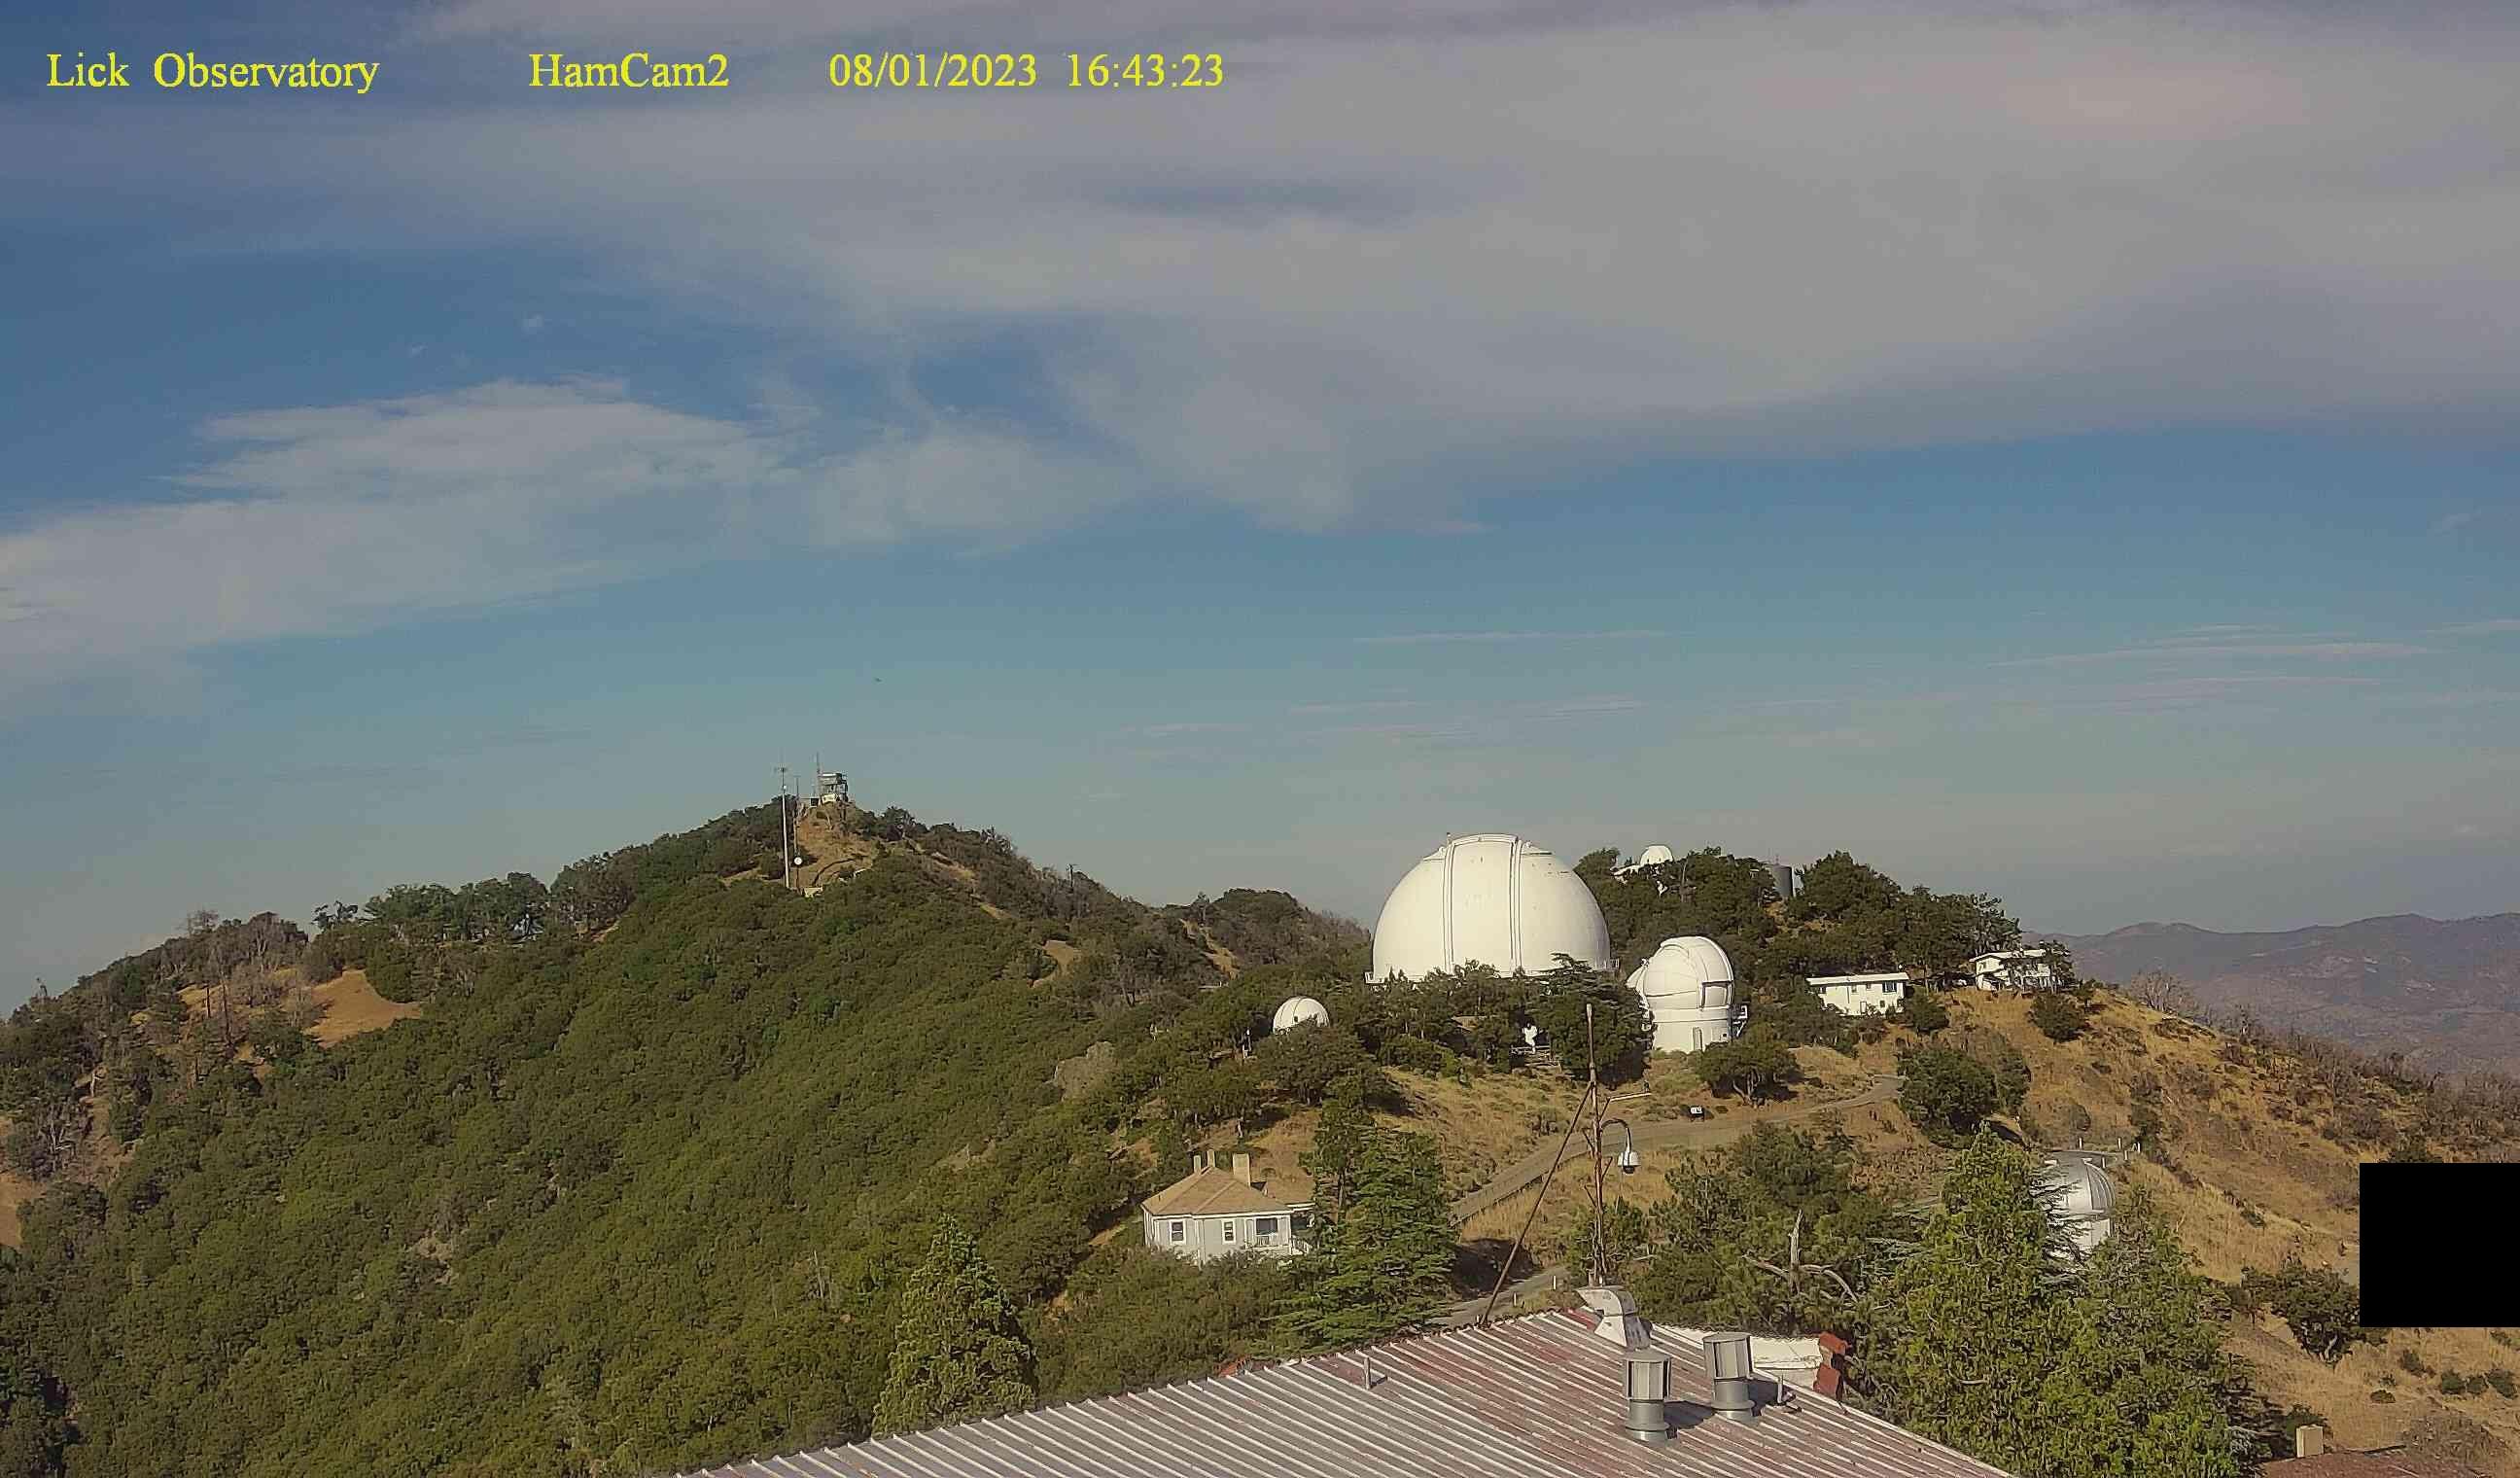 Licks Observatory